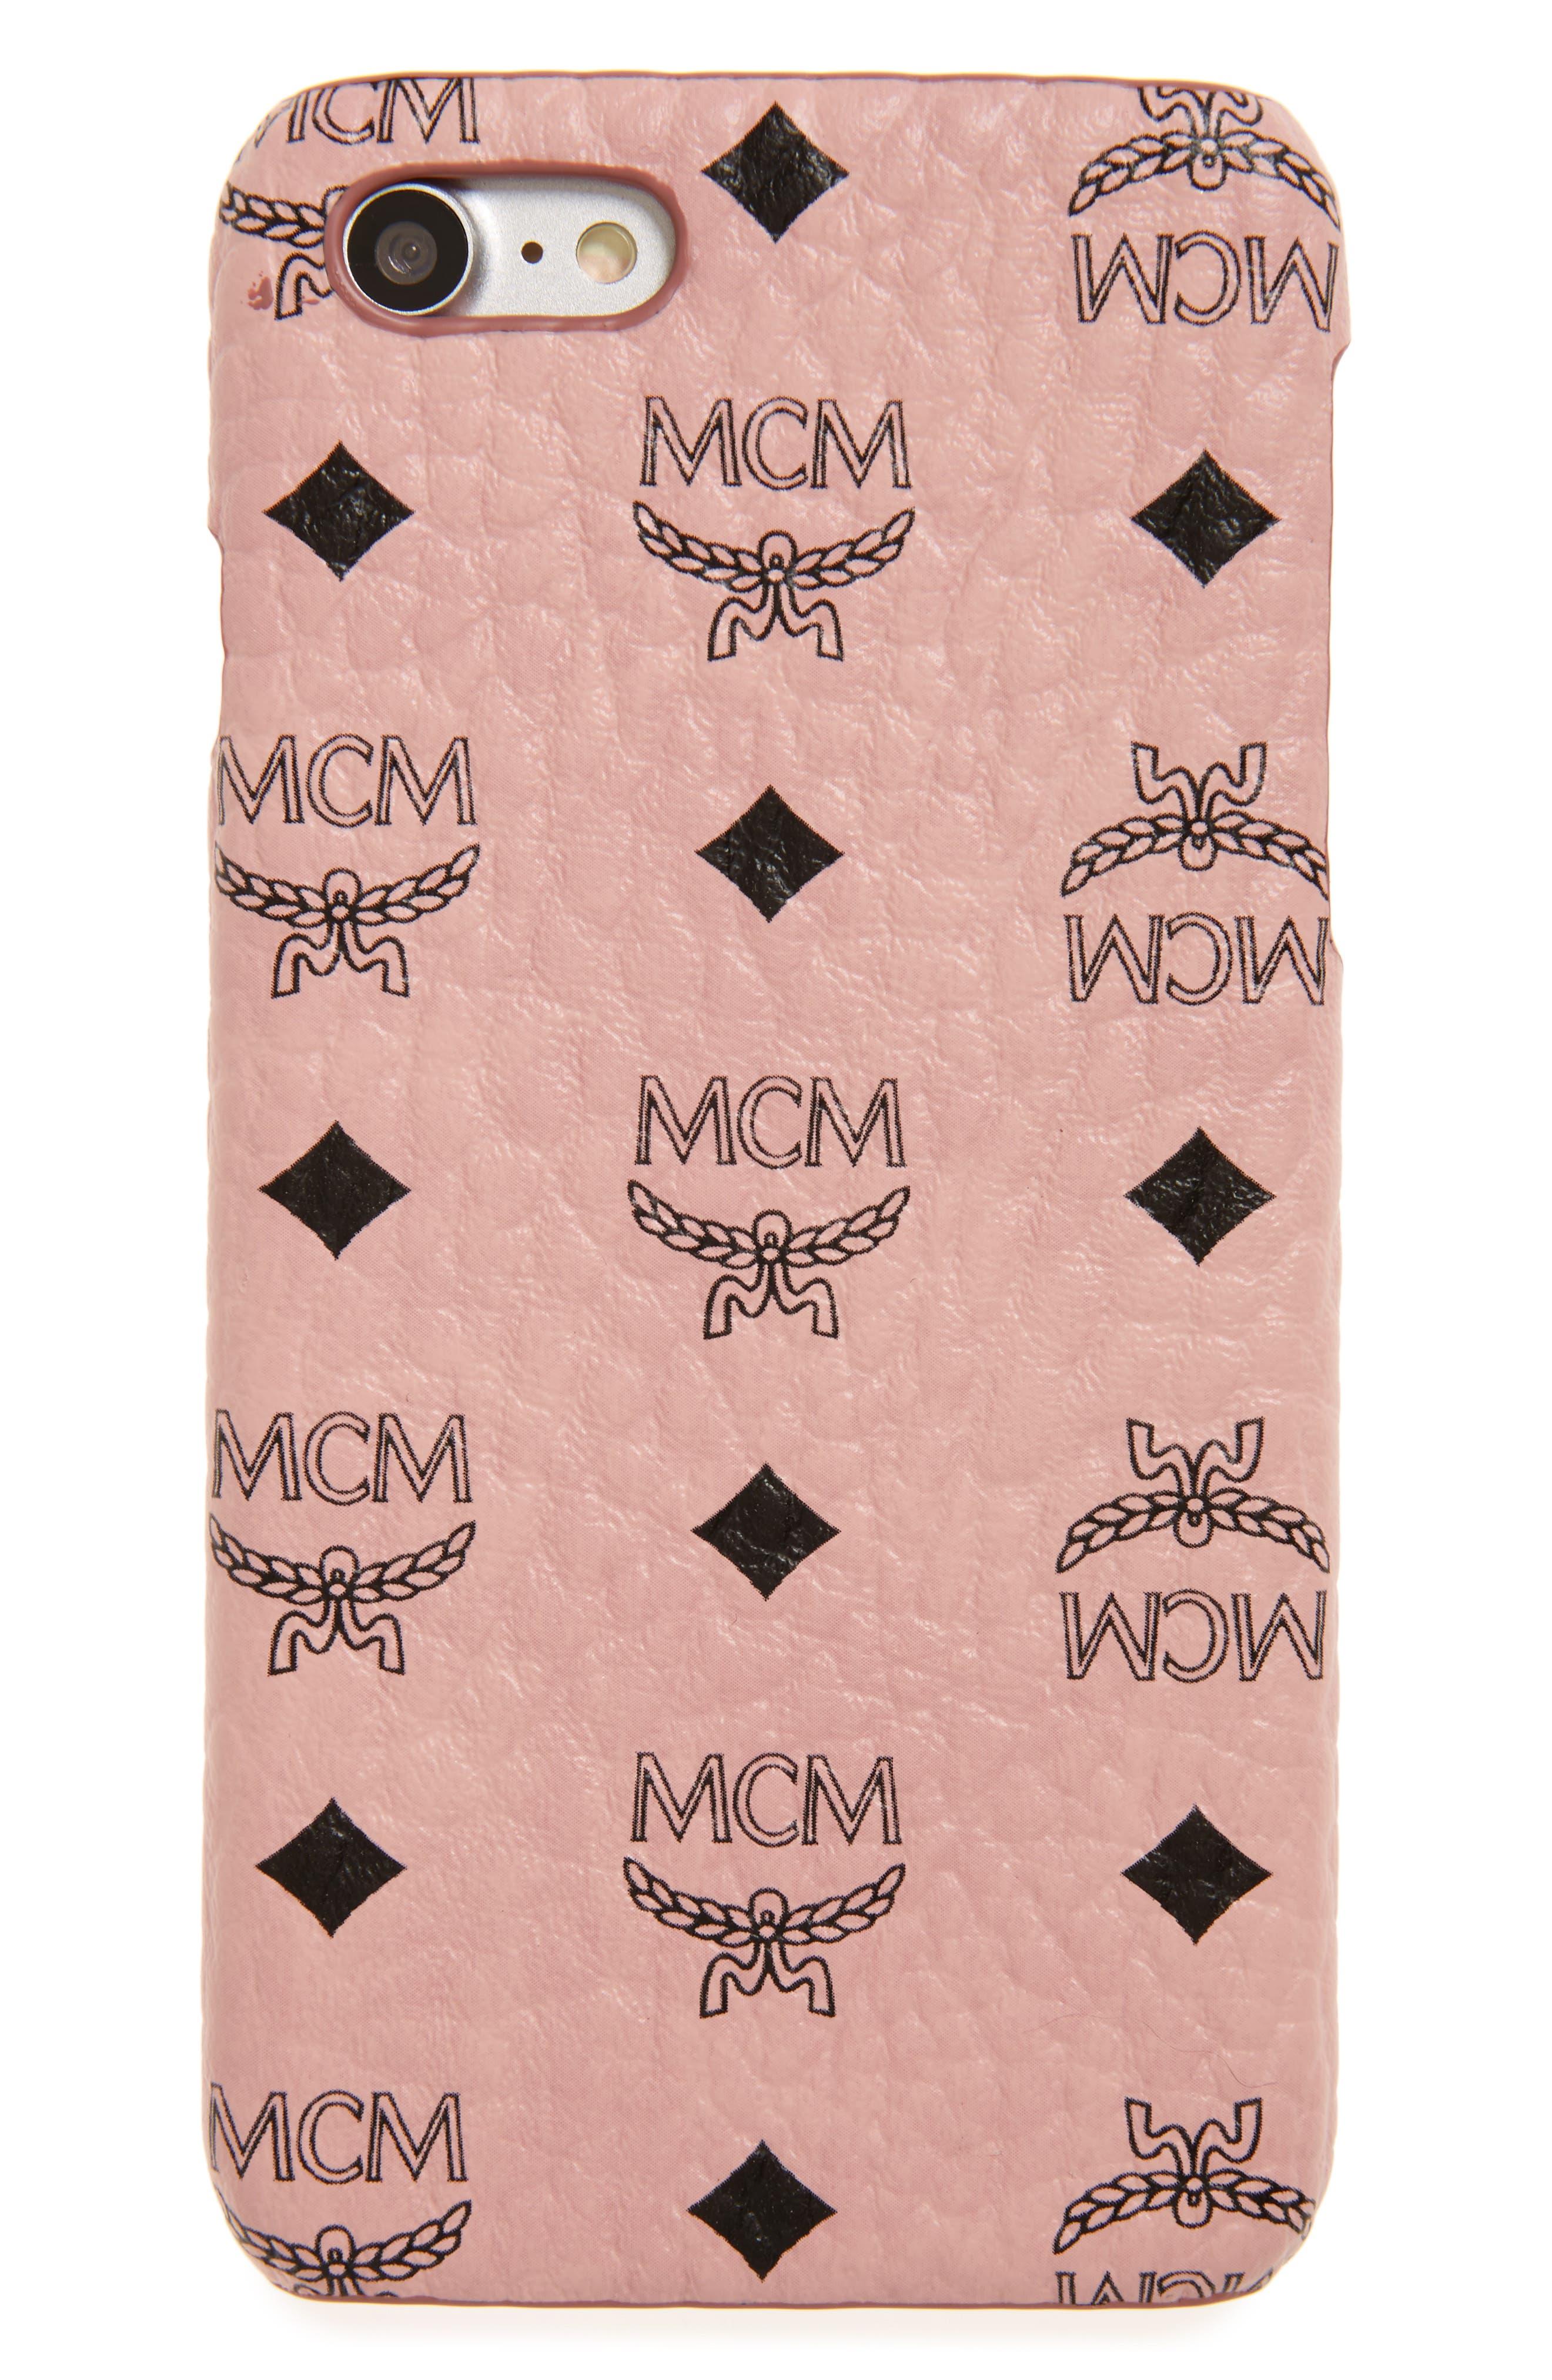 Main Image - MCM iPhone 6/7 Case